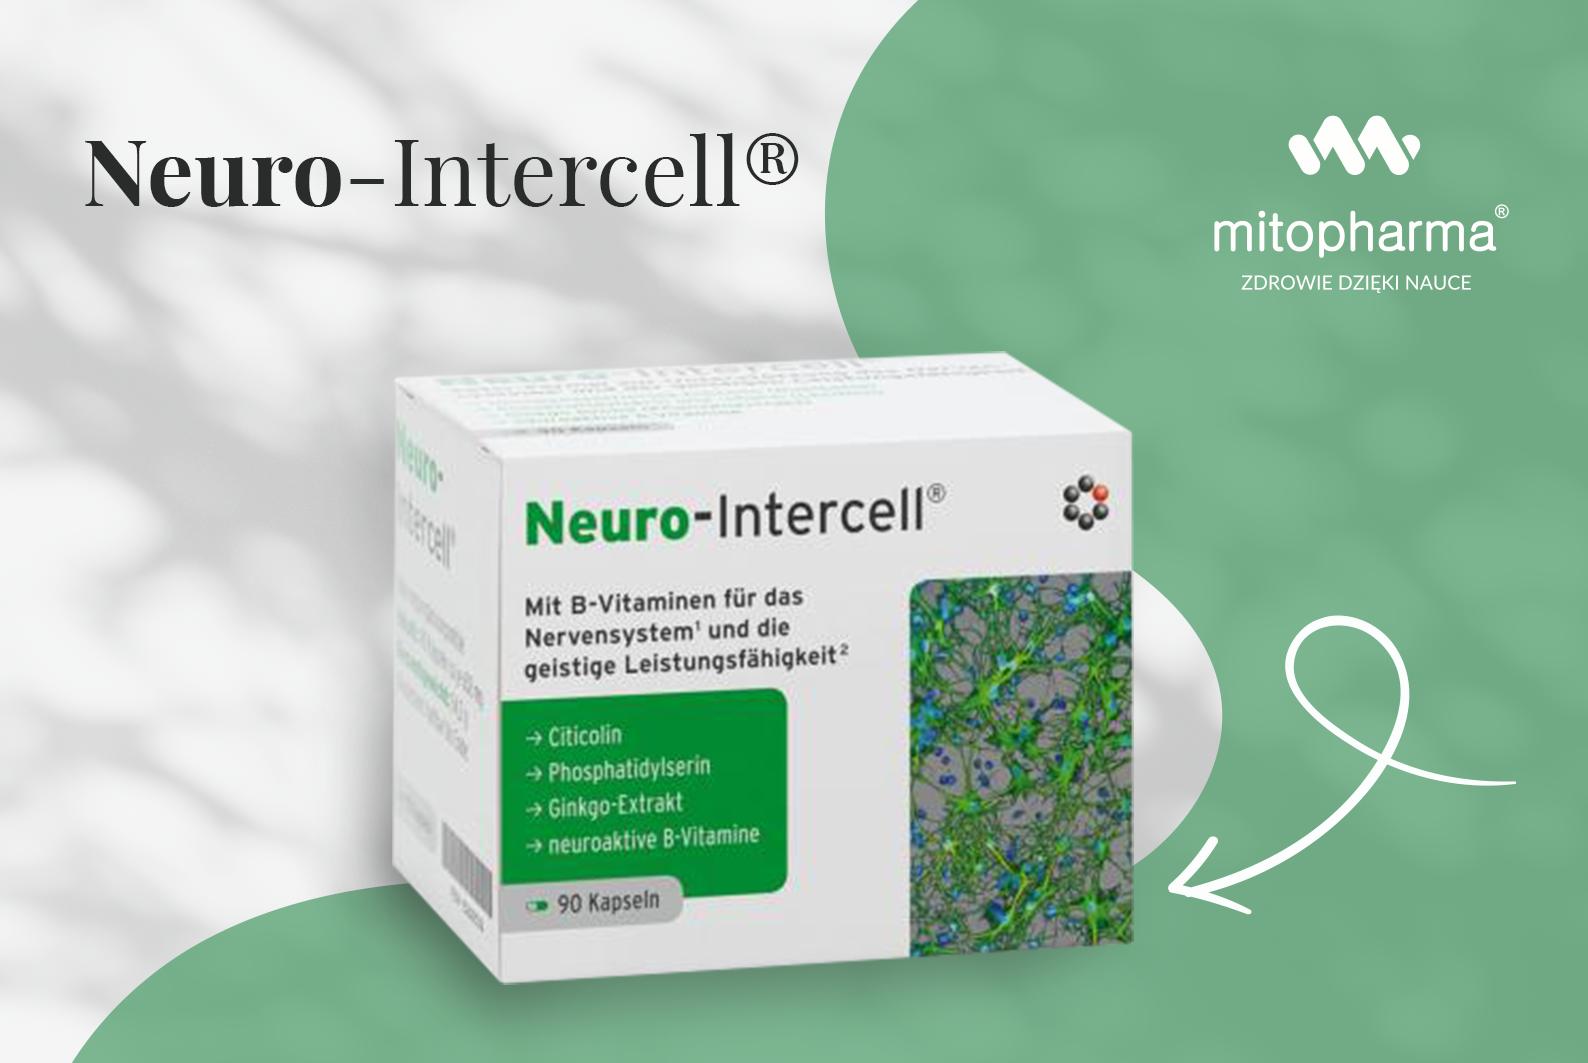 Neuro-Intercell®